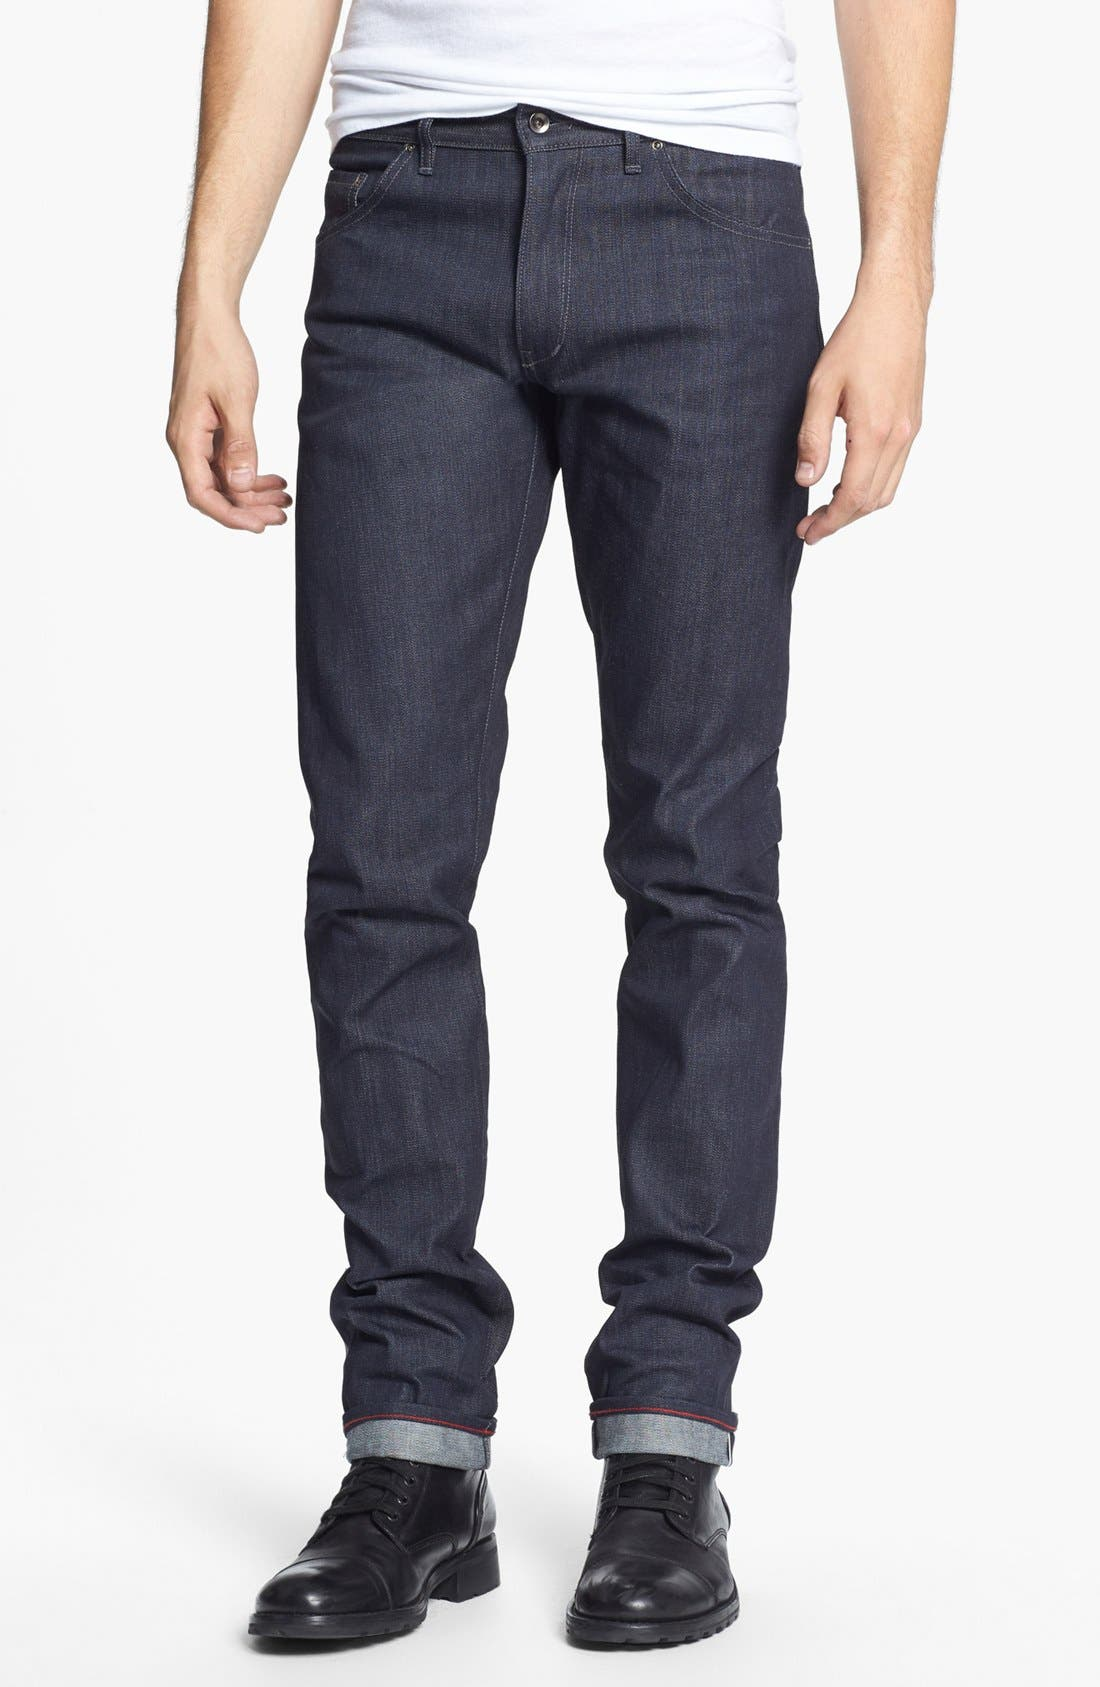 RALEIGH DENIM,                             'Martin' Skinny Fit Selvedge Jeans,                             Main thumbnail 1, color,                             401